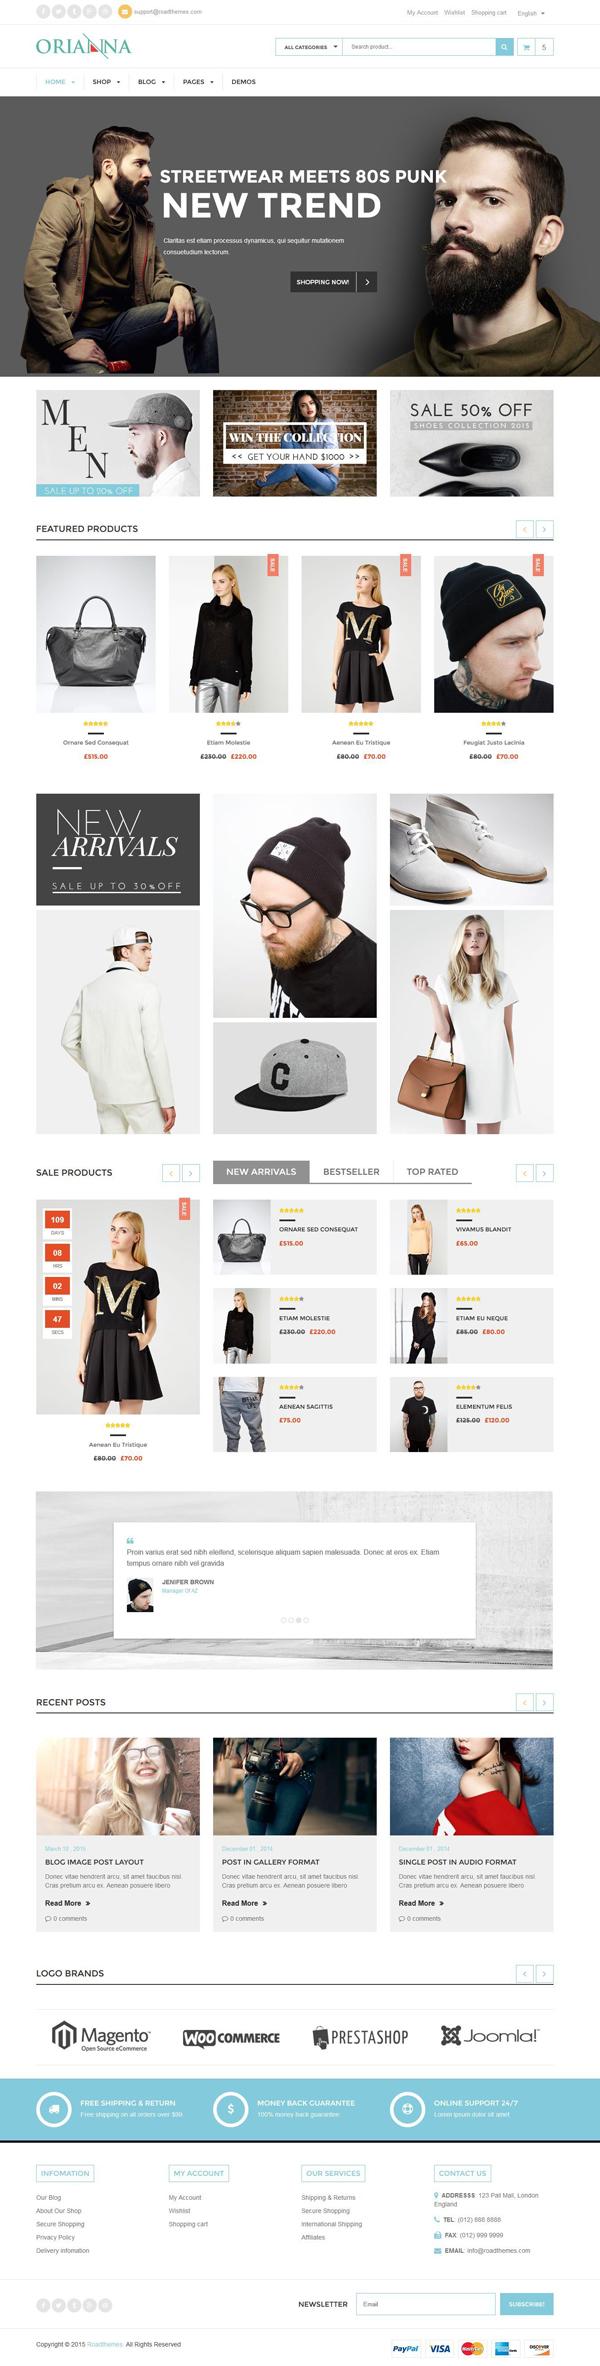 Orianna – Responsive WooCommerce Fashion Theme